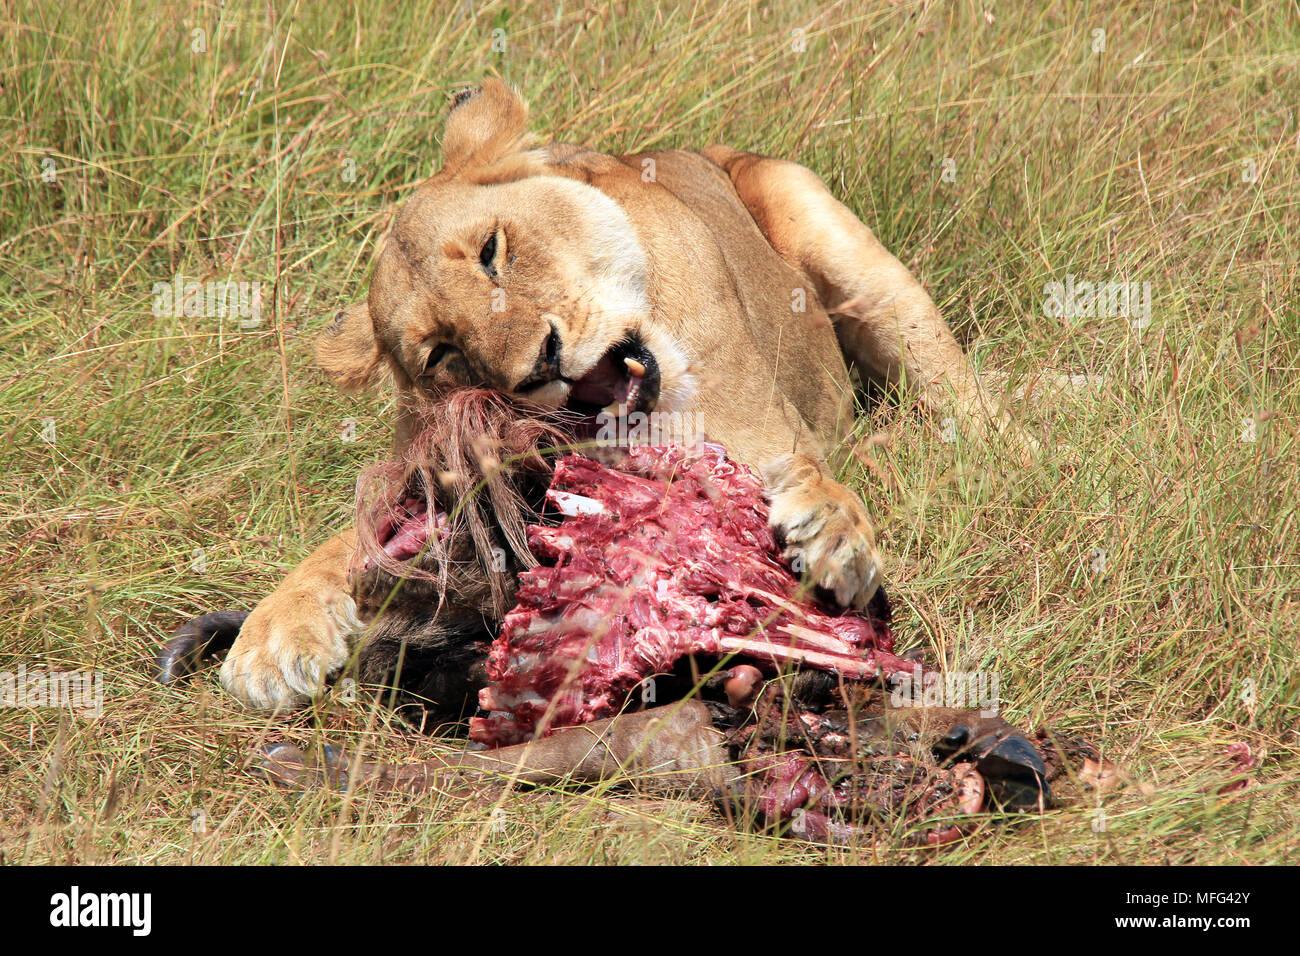 Lioness (Panthera Leo) Feeding on a Wildebeest. Maasai Mara, Kenya - Stock Image